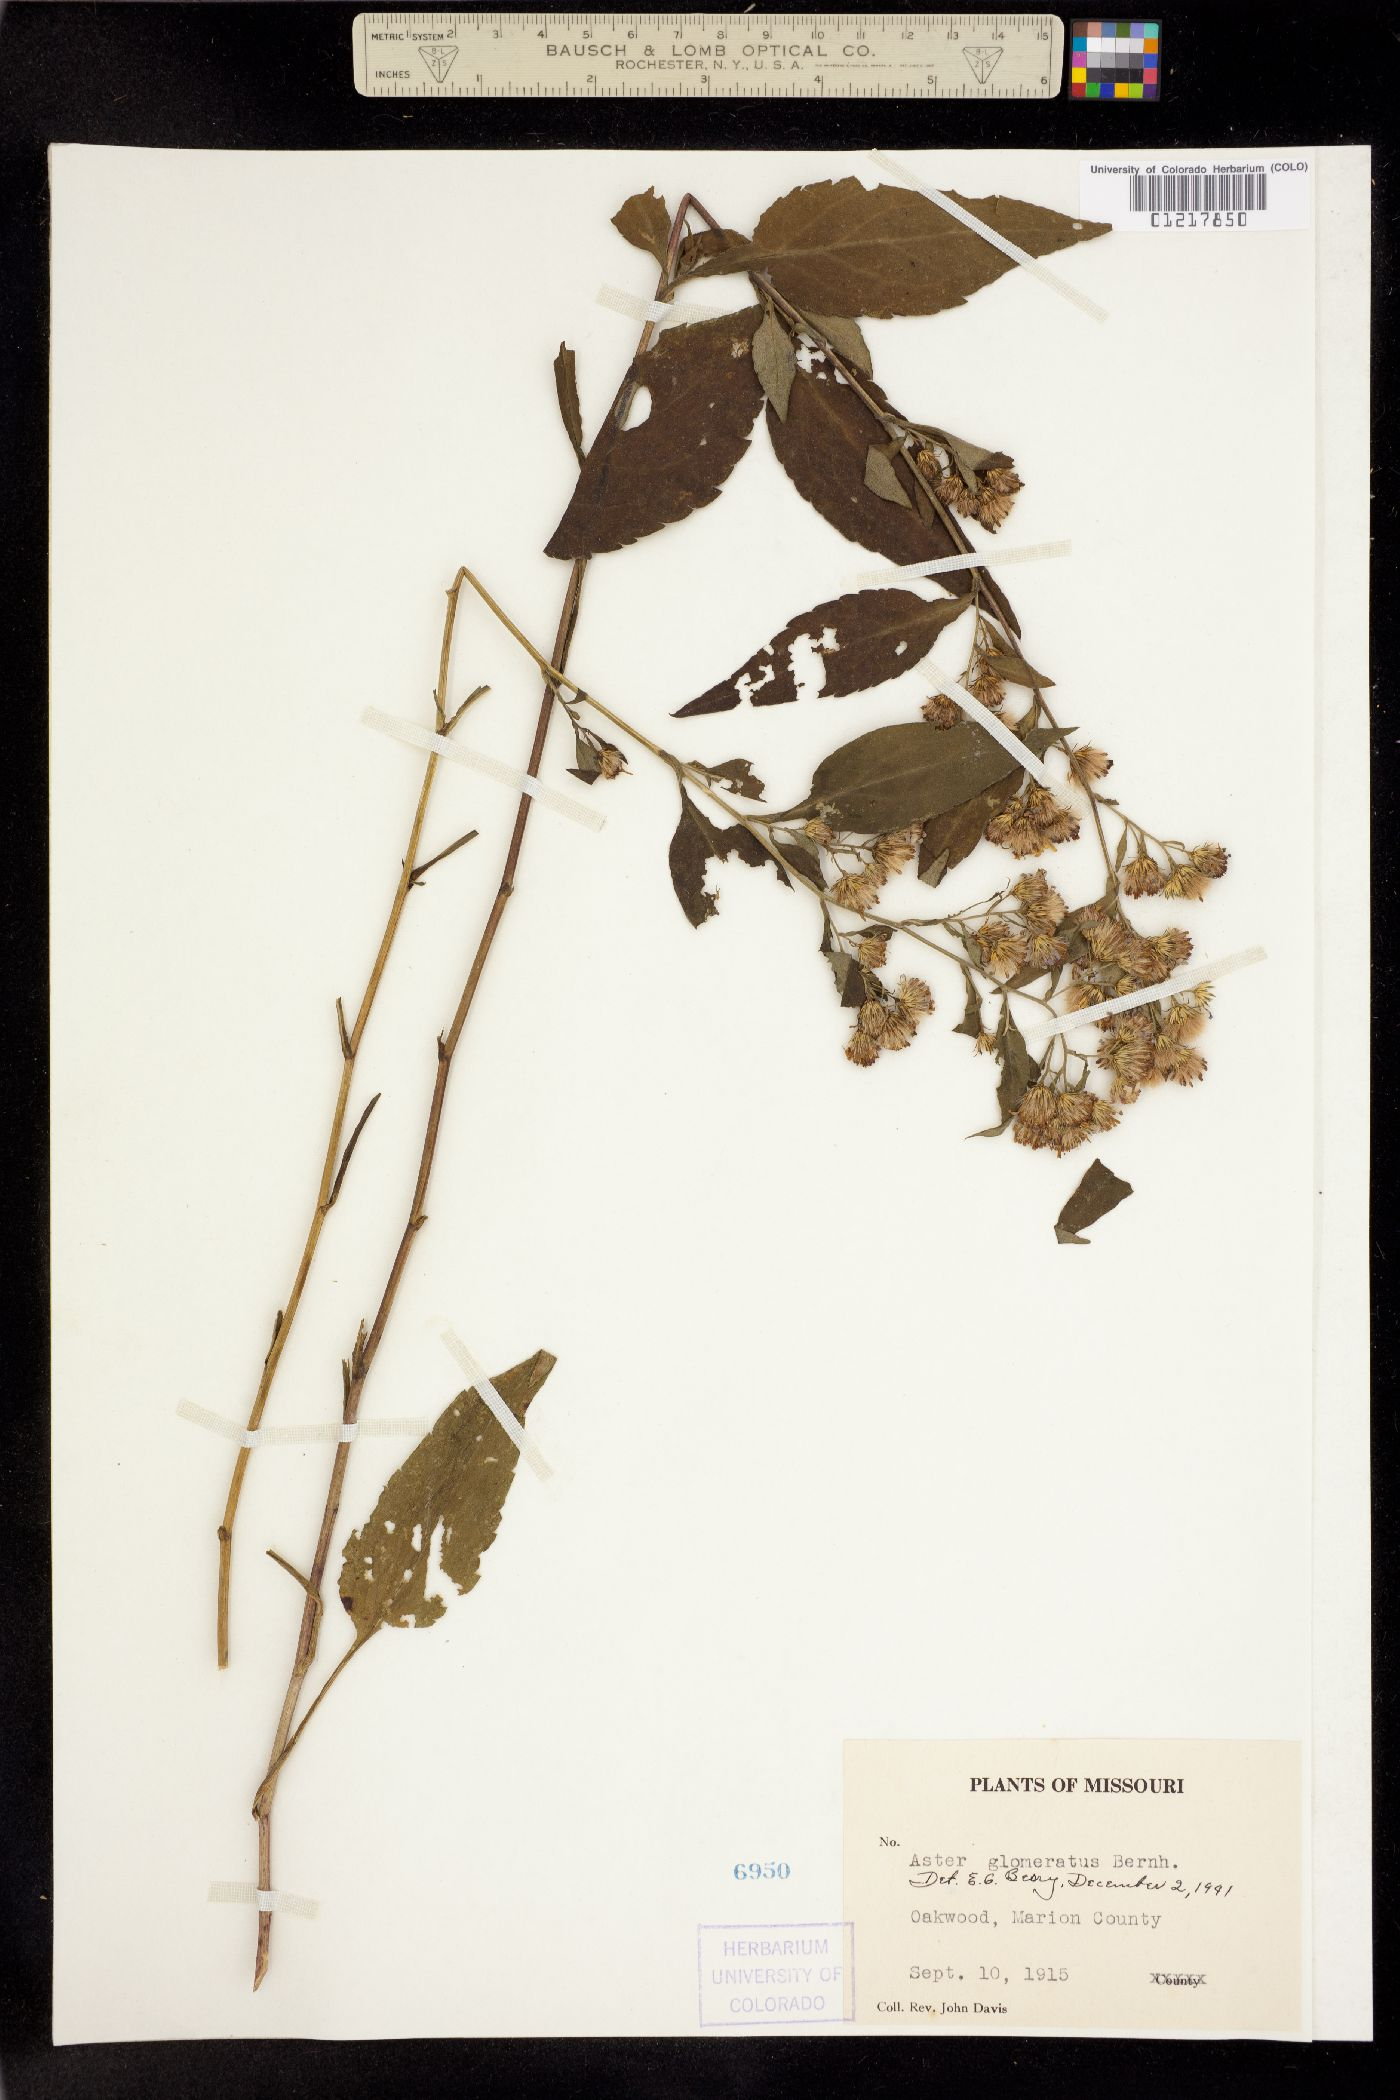 University of Colorado Museum of Natural History Herbarium